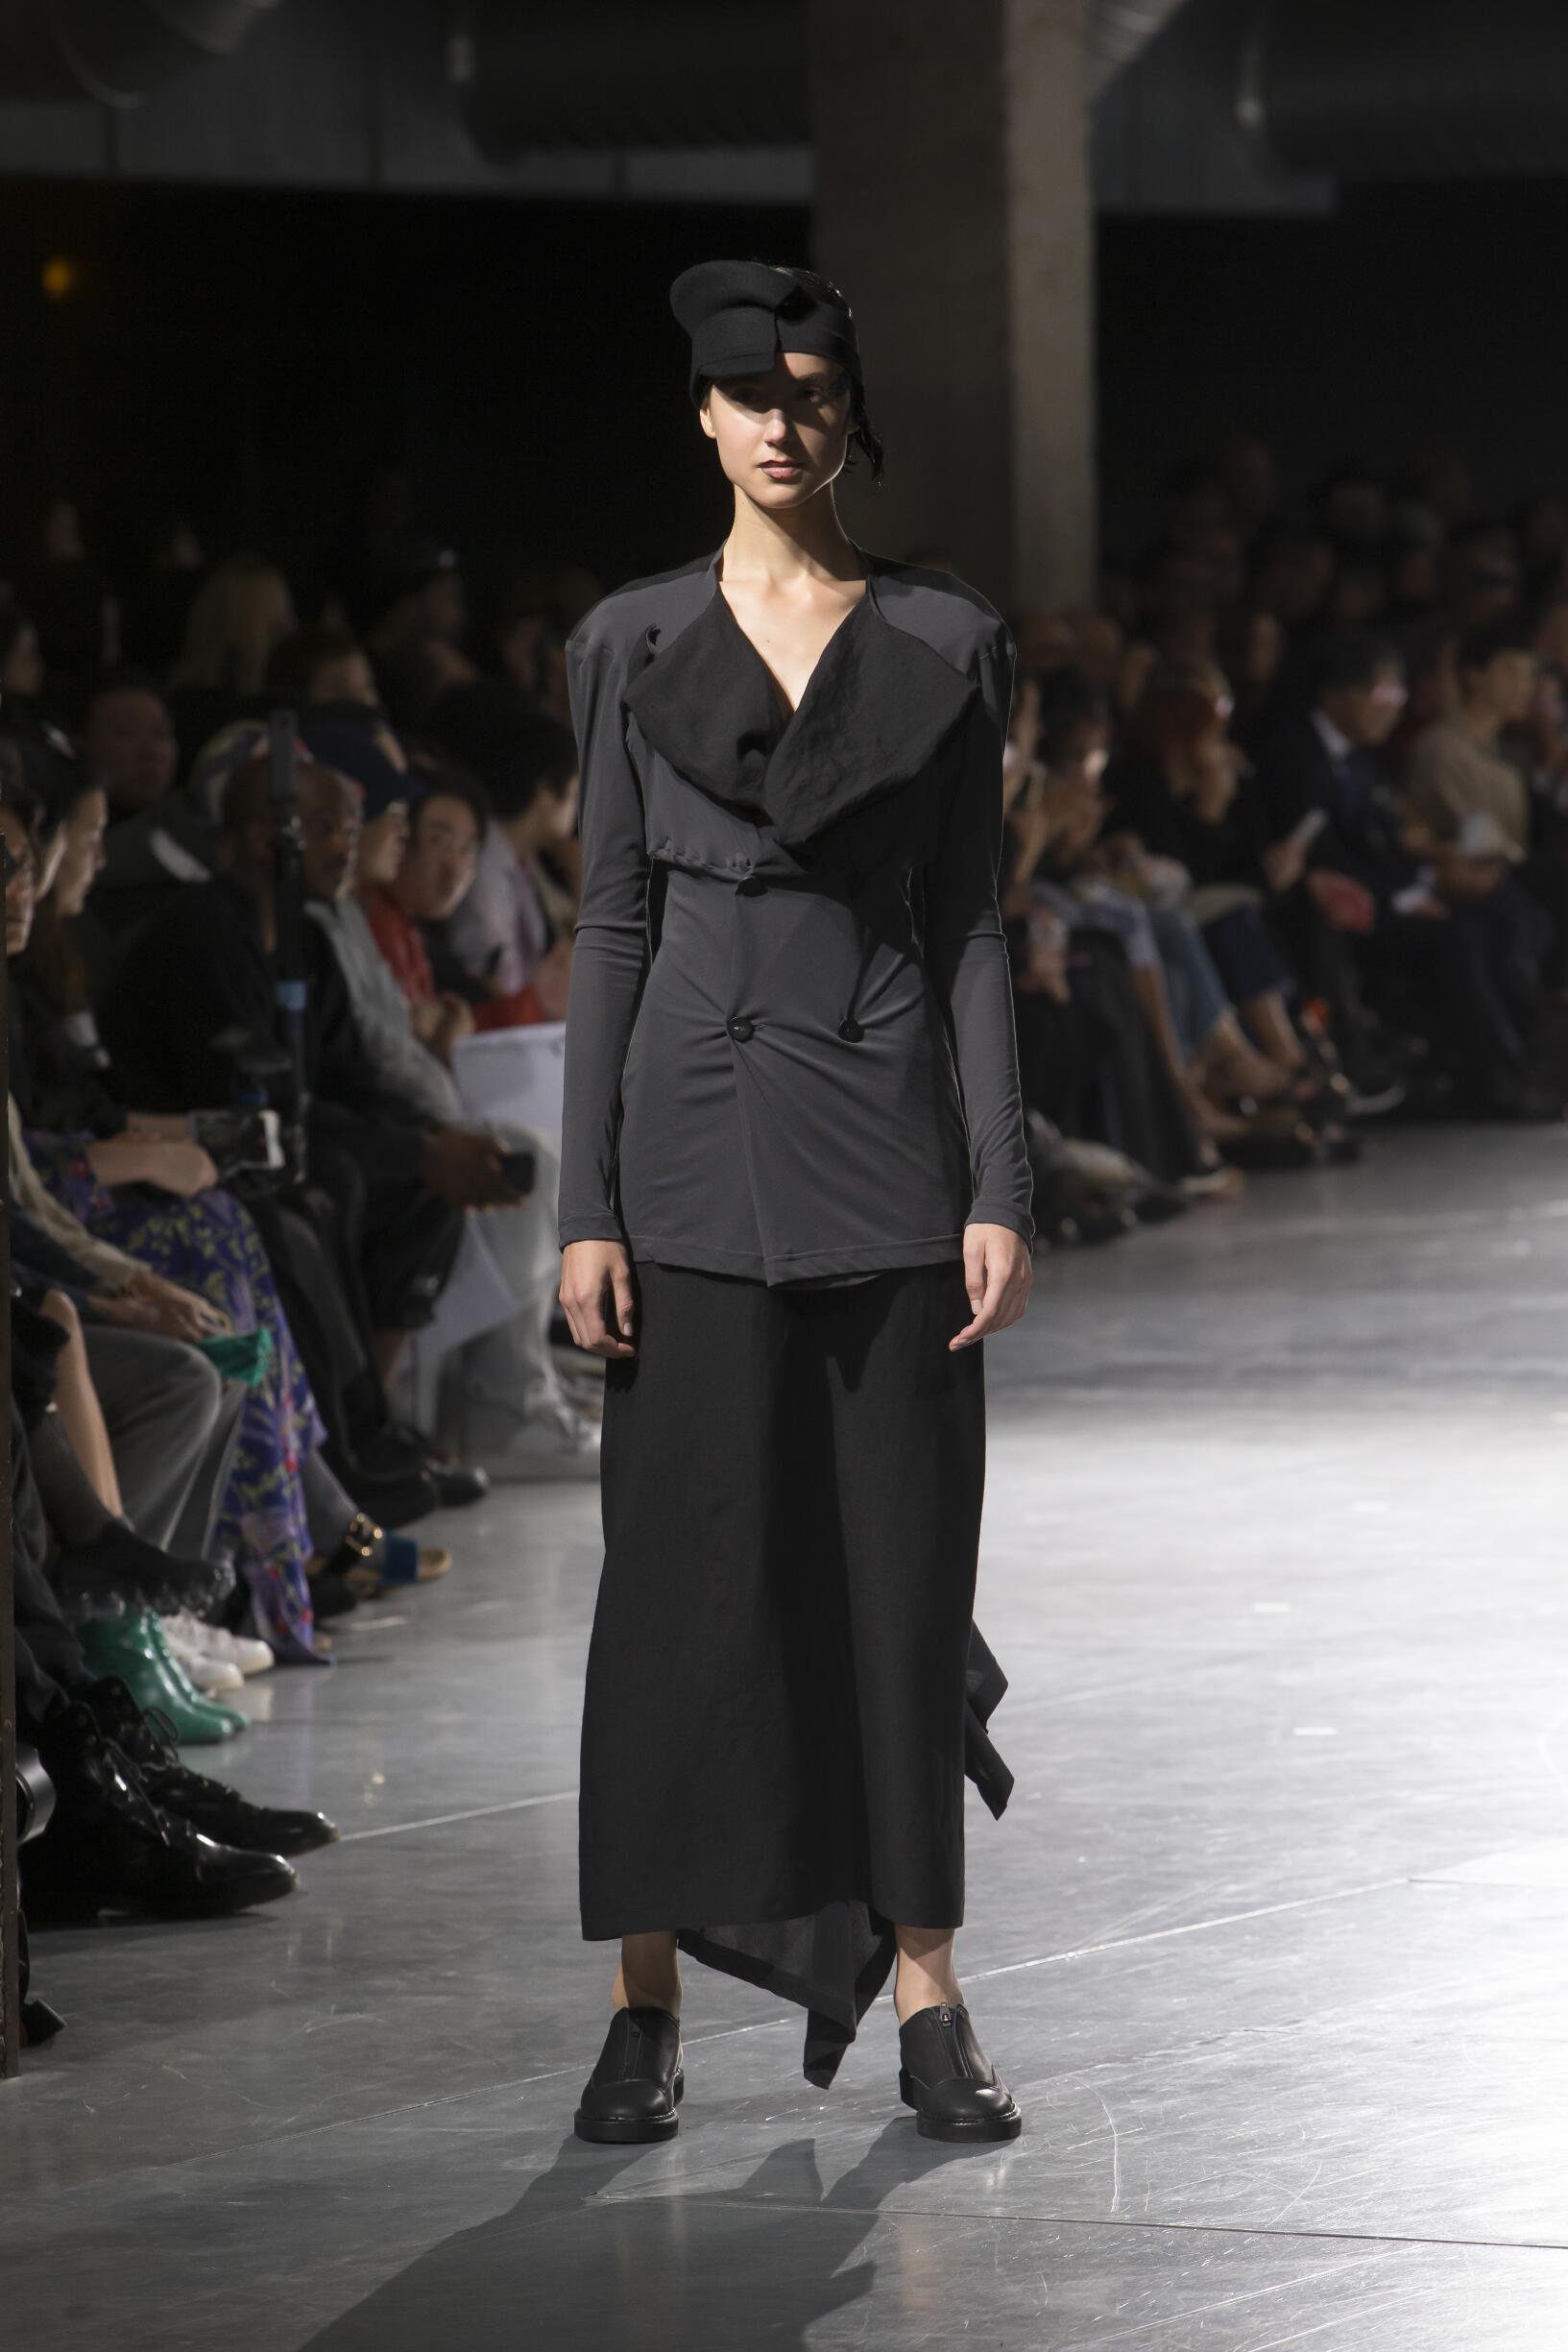 Spring Fashion Trends 2018 Yohji Yamamoto